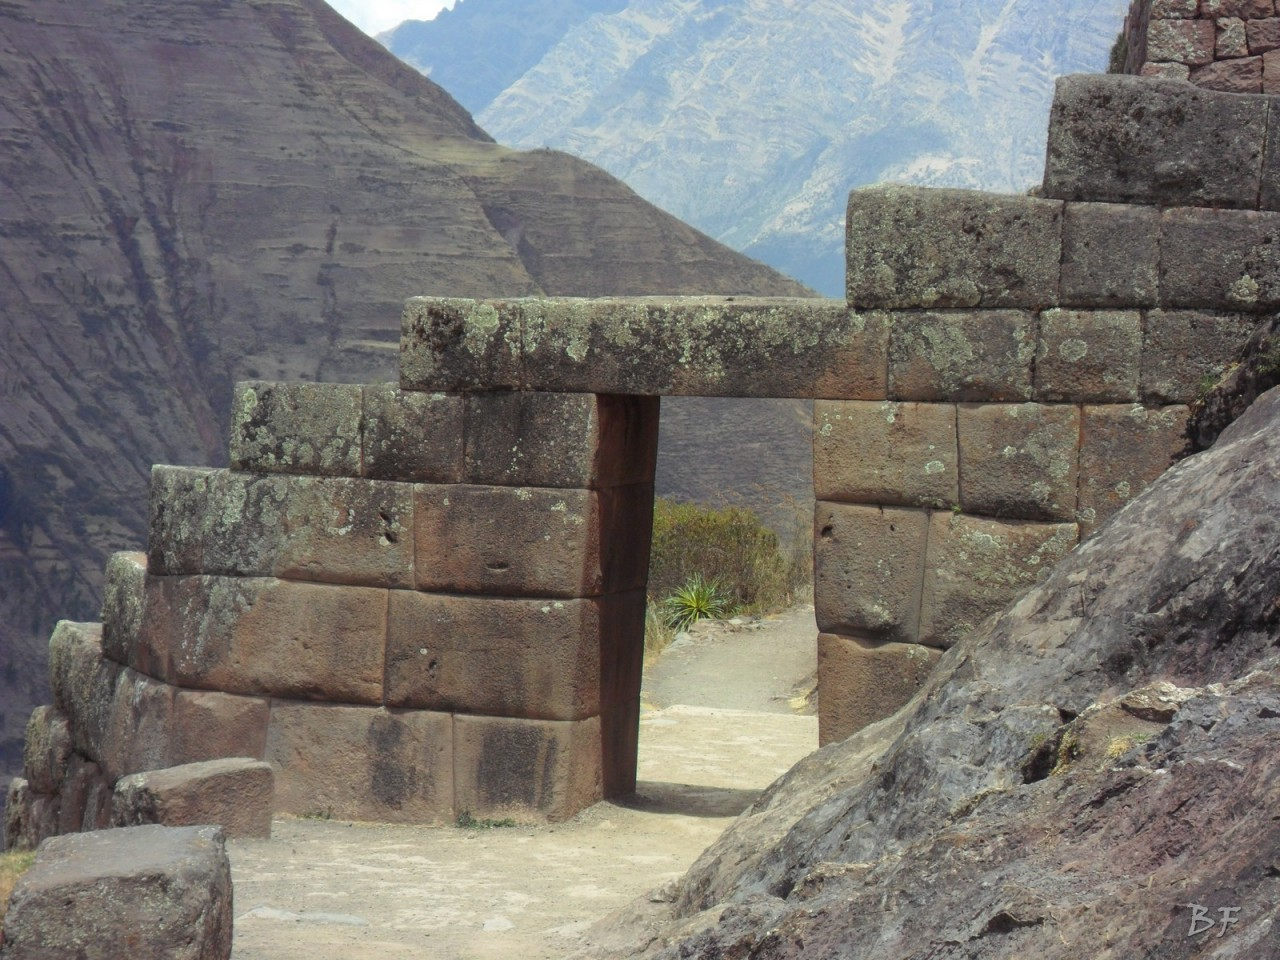 Mura-Poligonali-Megaliti-Altari-Rupestri-Pisac-Cusco-Perù-28